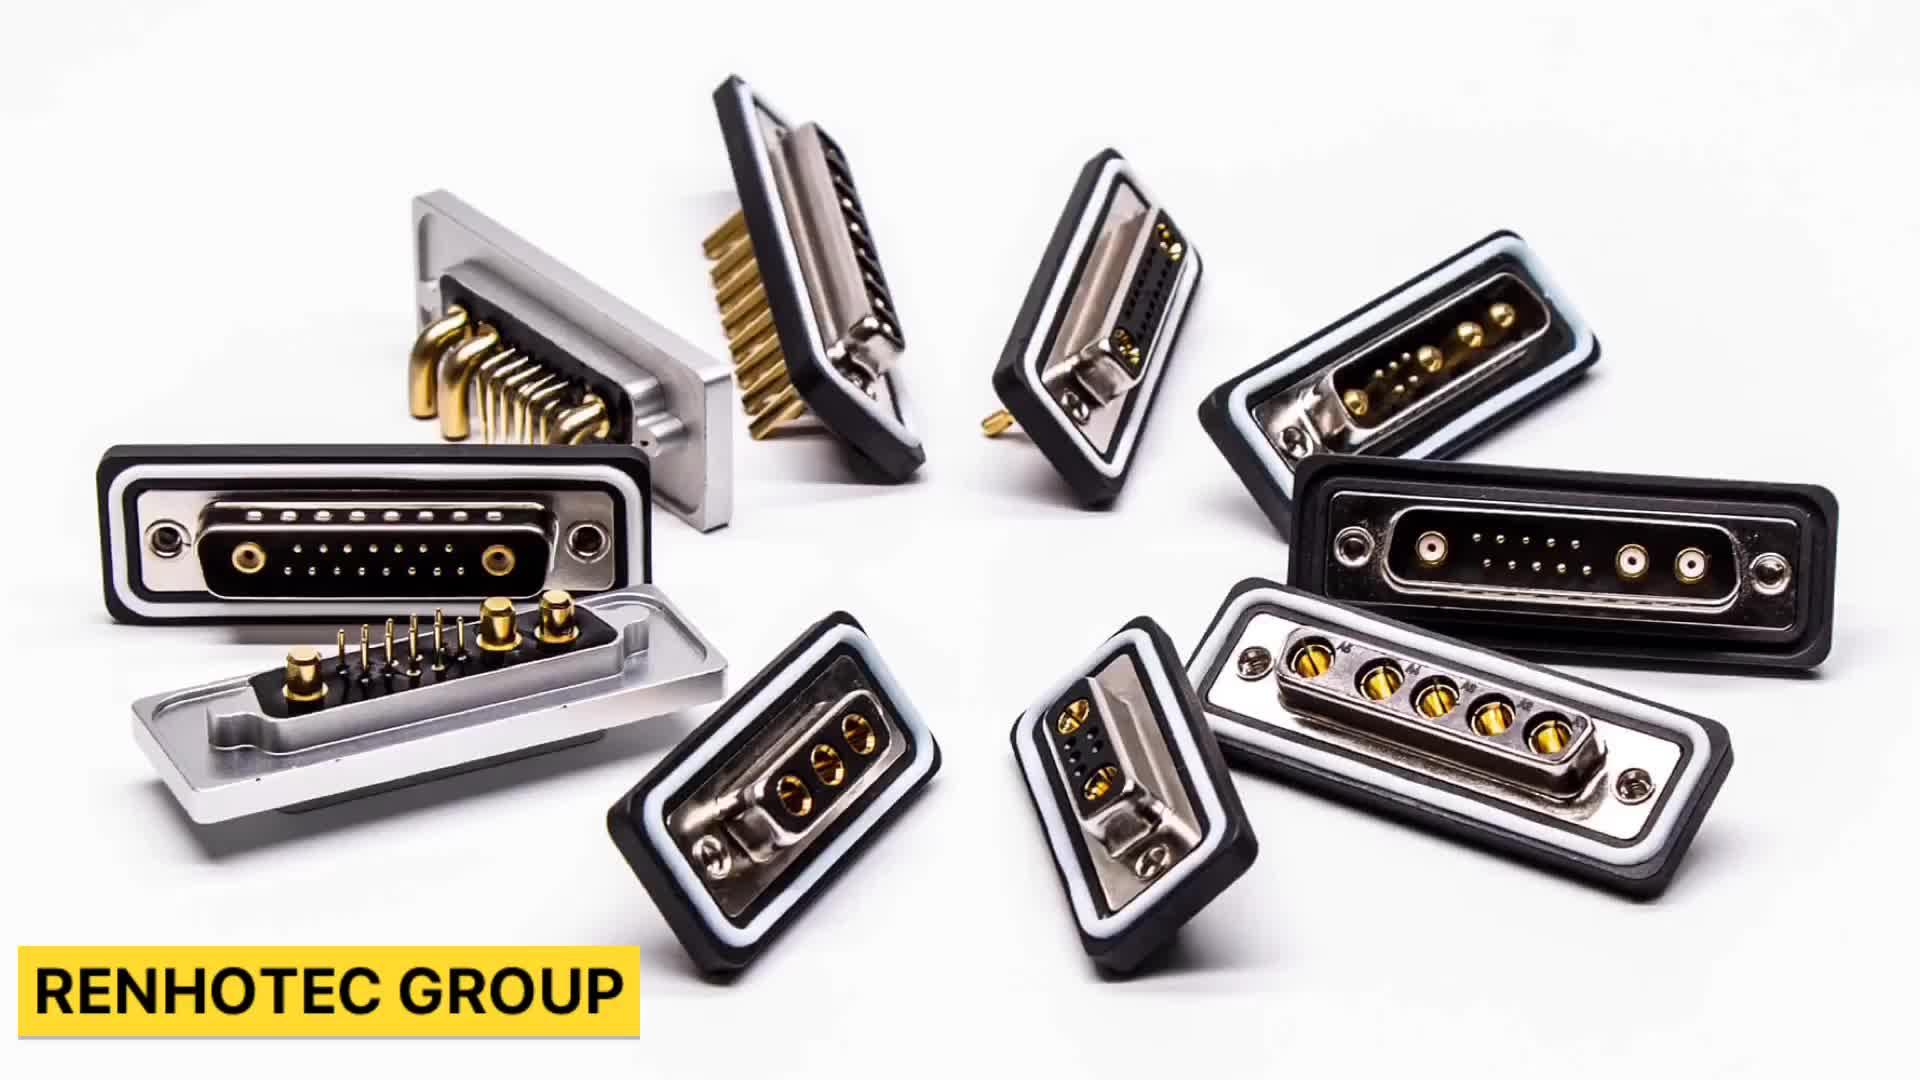 Front Open Screwlock Harpoon Plug Vertical 9 Pins D-Sub Connector